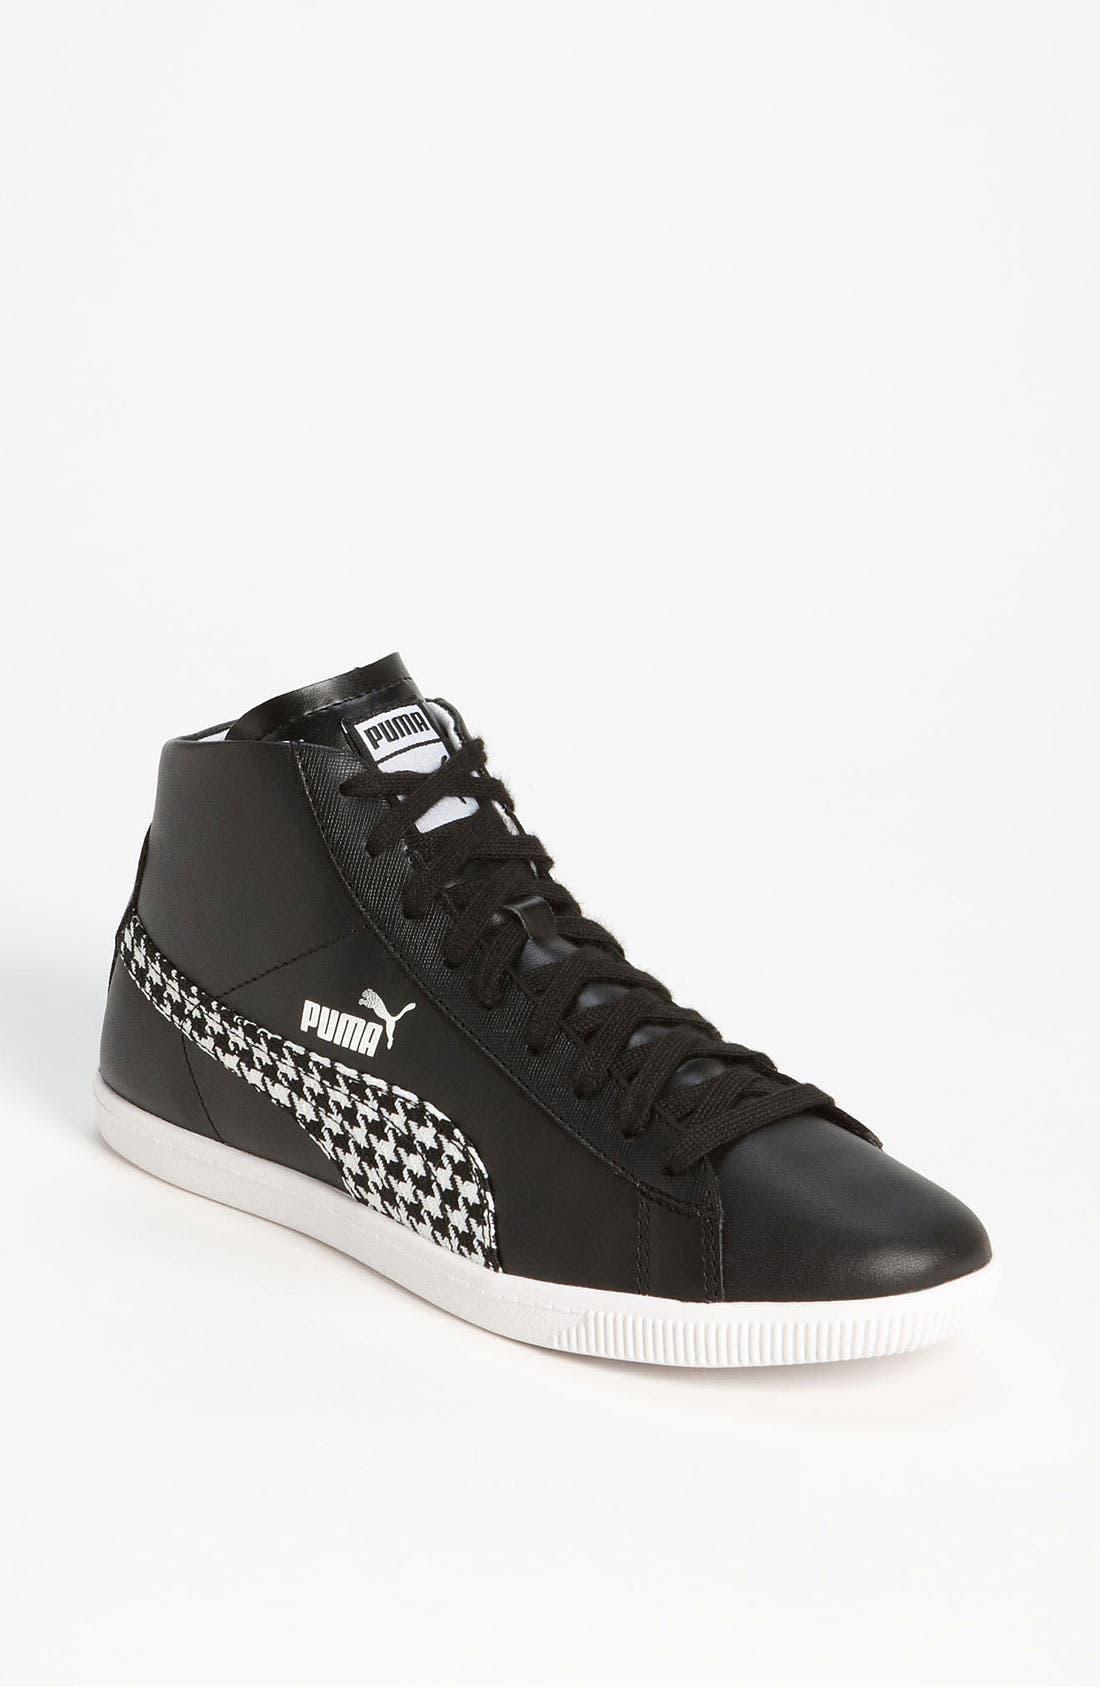 Main Image - PUMA 'Glyde Herringbone Mid' Sneaker (Women)